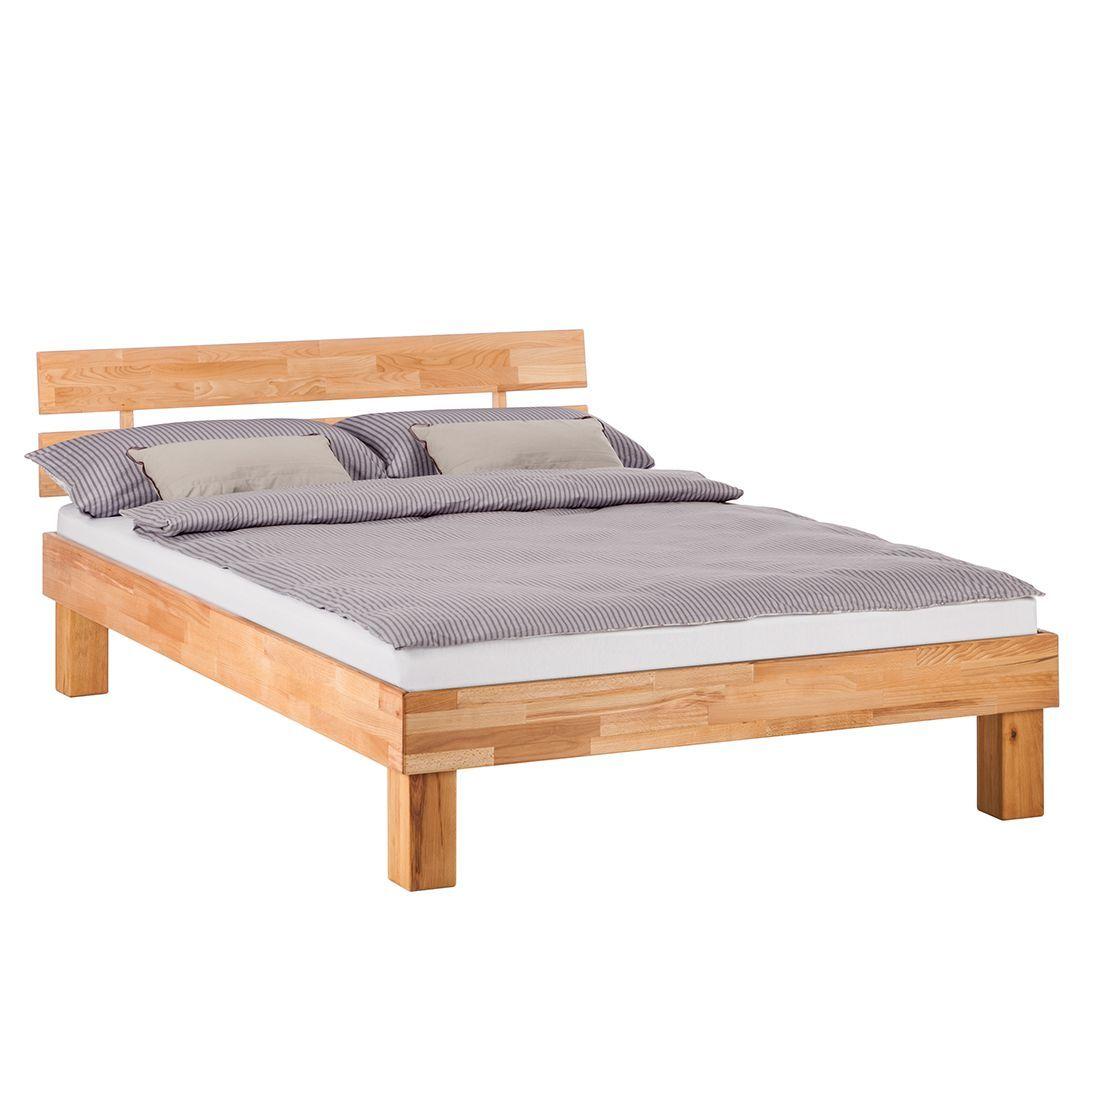 Massivholzbett Areswood Bett Bettgestell Und Bett Ideen